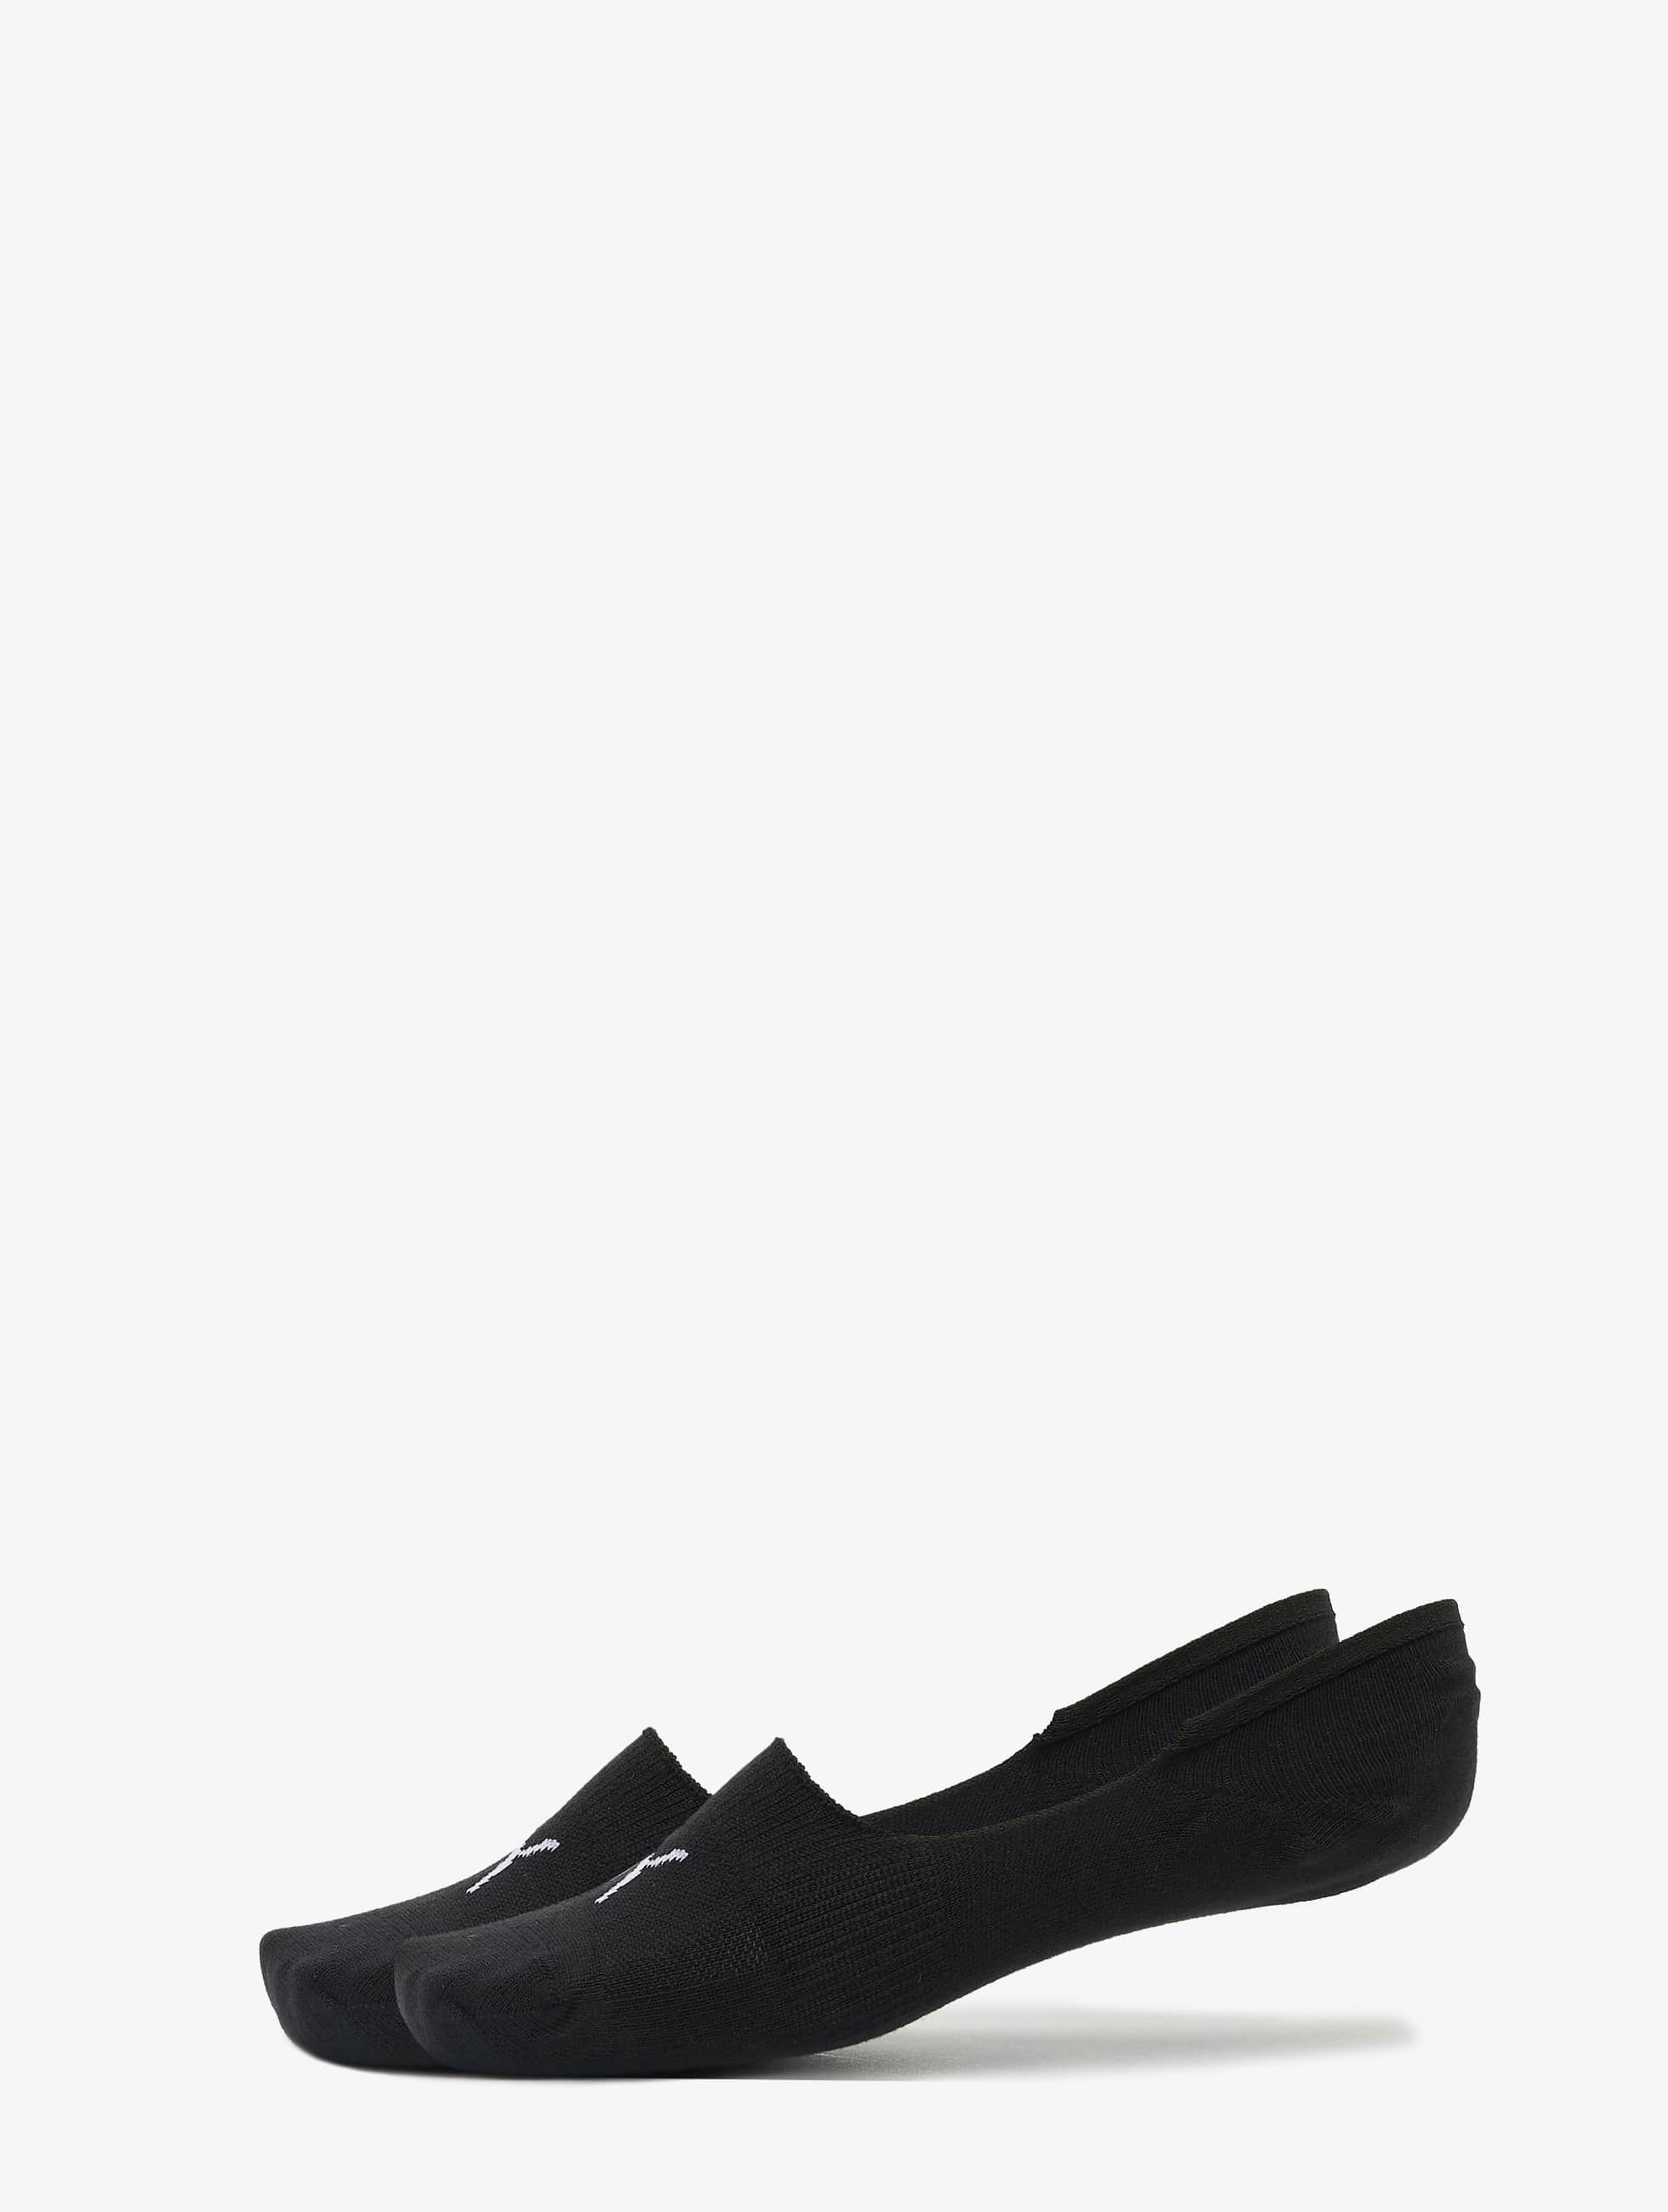 Puma Männer,Frauen Socken 2-Pack Footies in schwarz